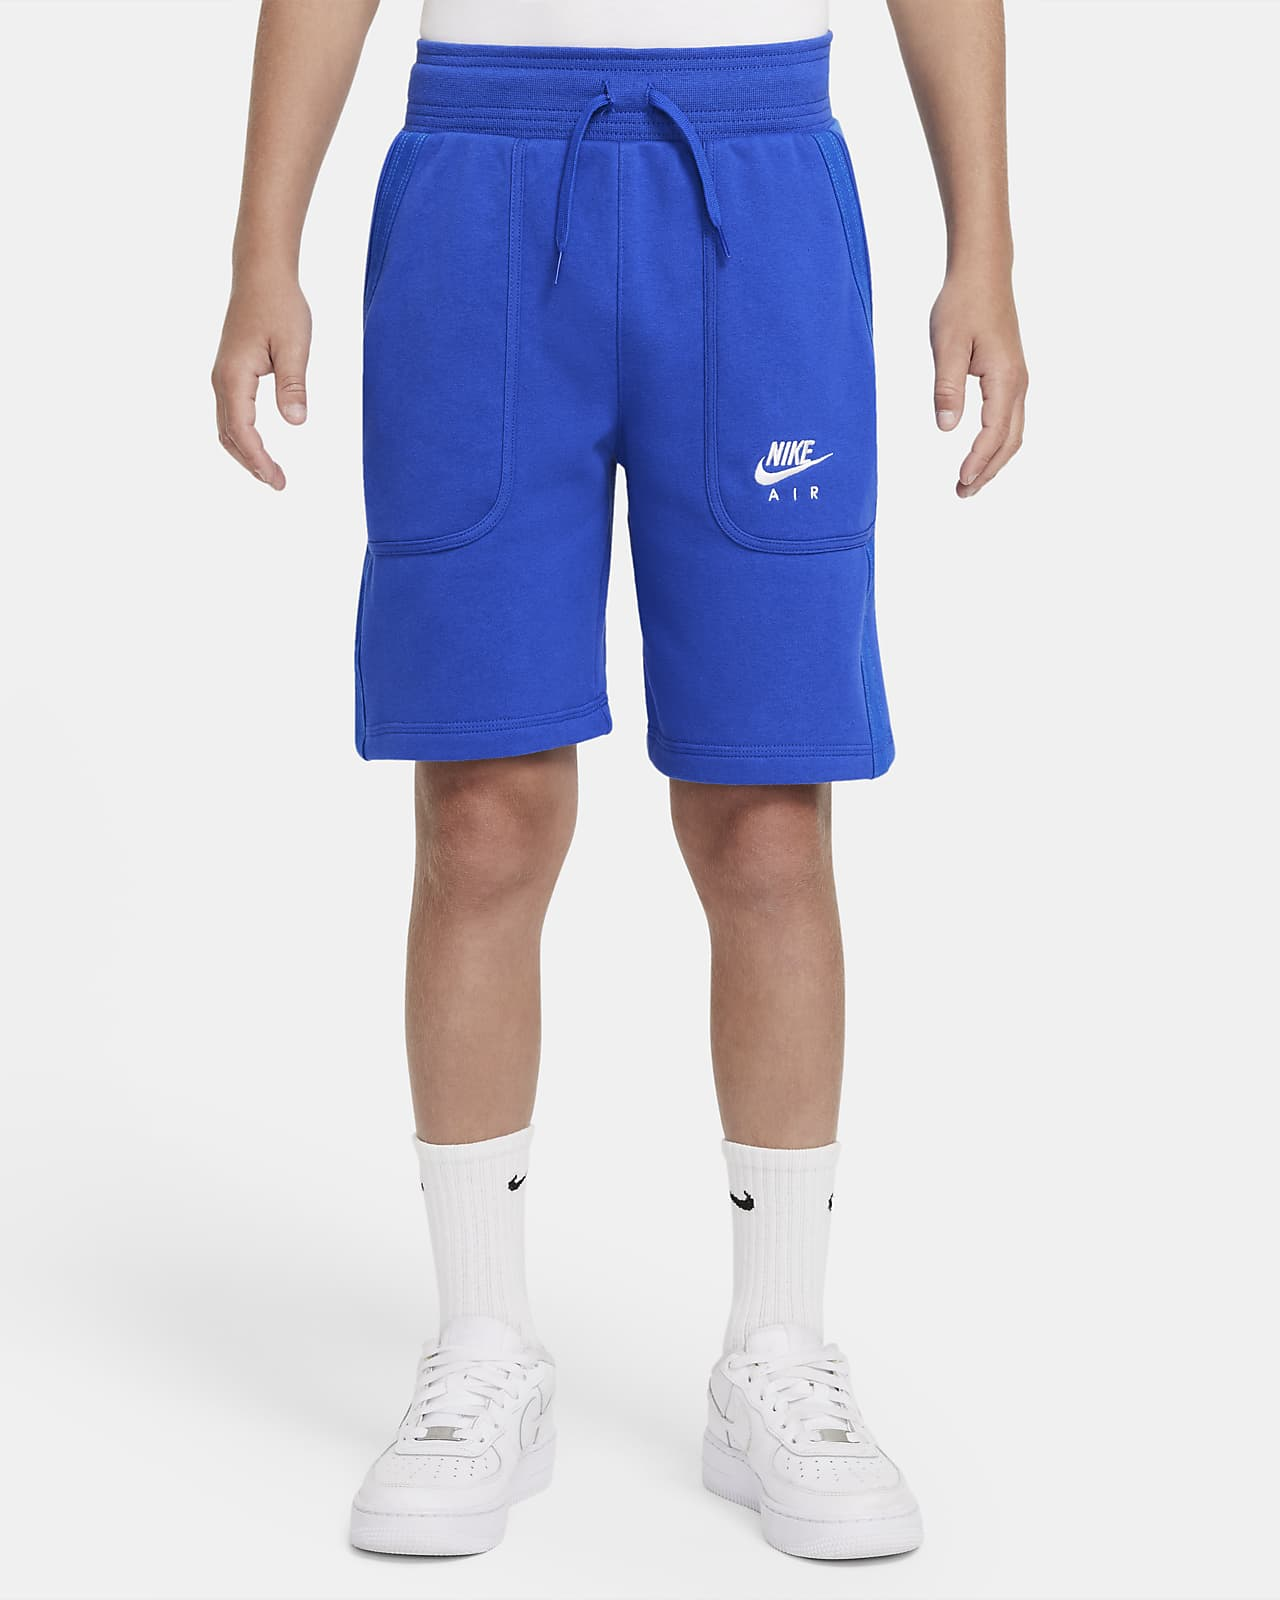 Nike Air-shorts i french terry til store børn (drenge)